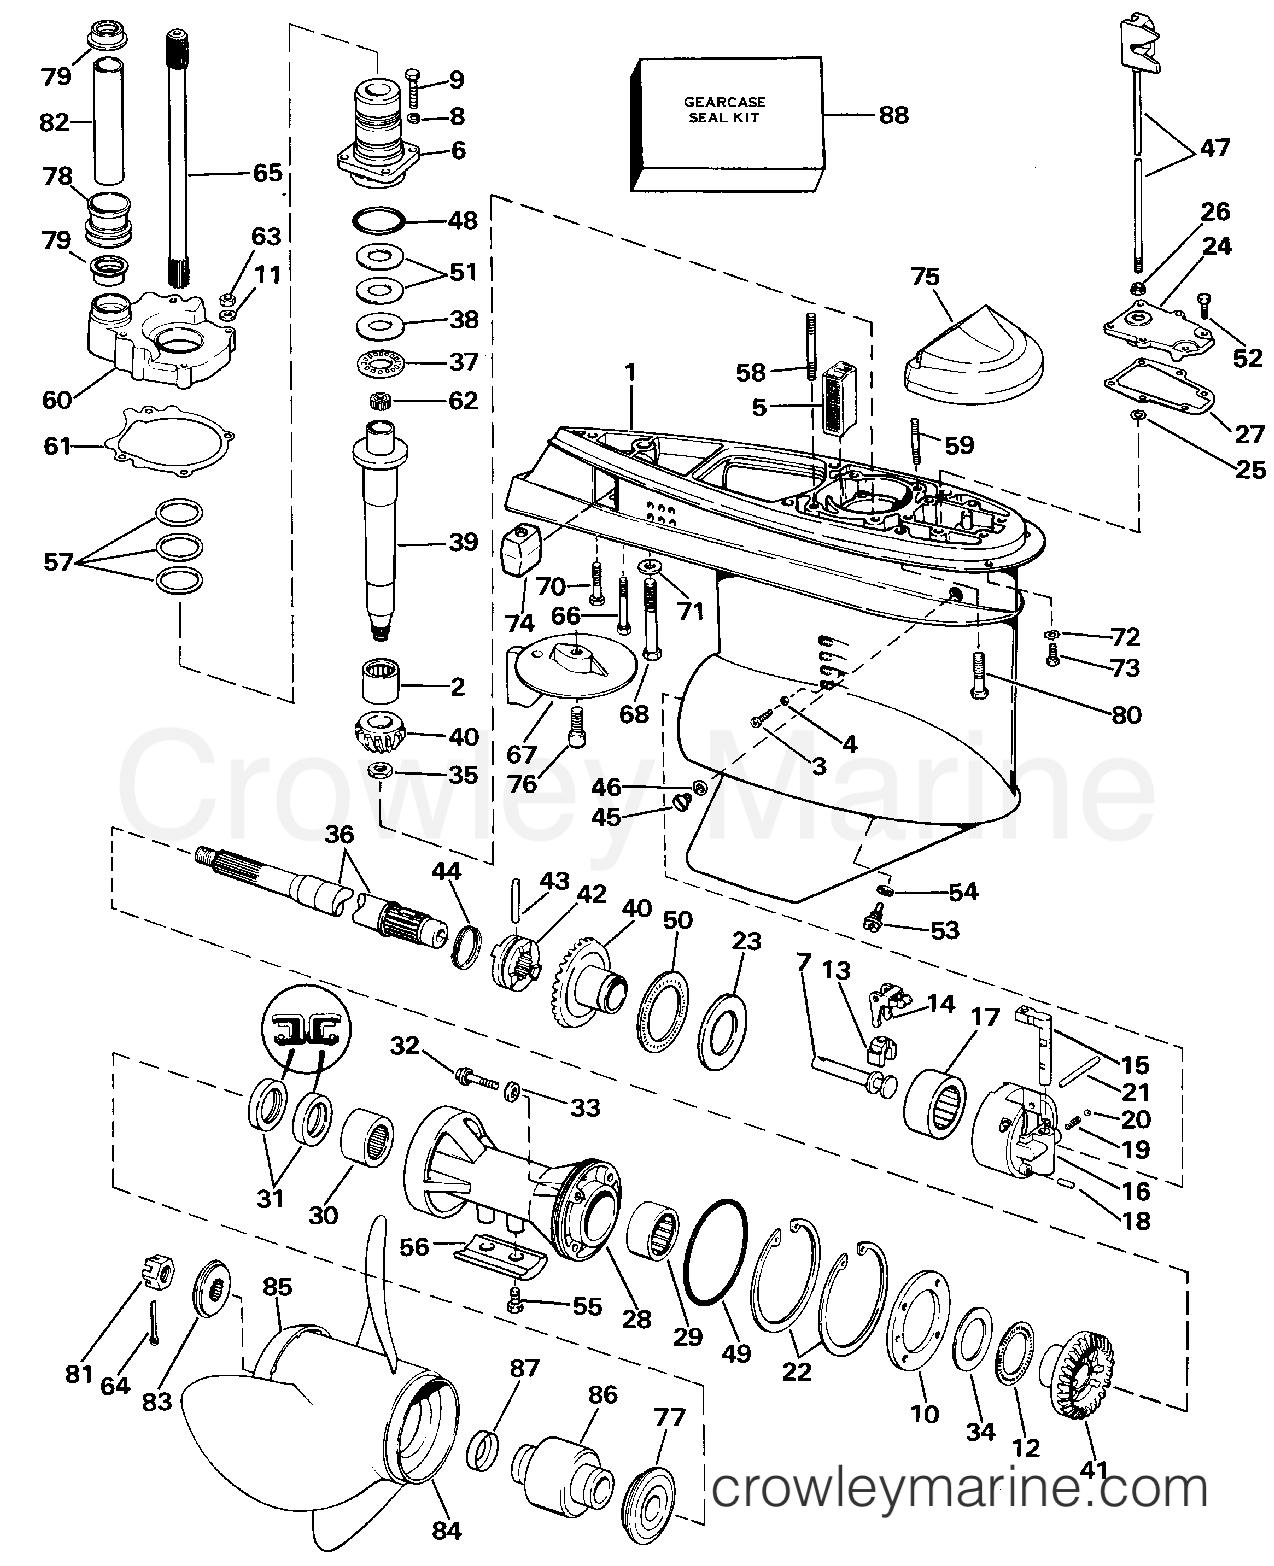 Omc Water Pump Diagram Inboard Outboard Wiring Diagrams Lower Gearcase Stern Drive Amarj Crowley Marine Crowleymarine Com Sterndrive Parts